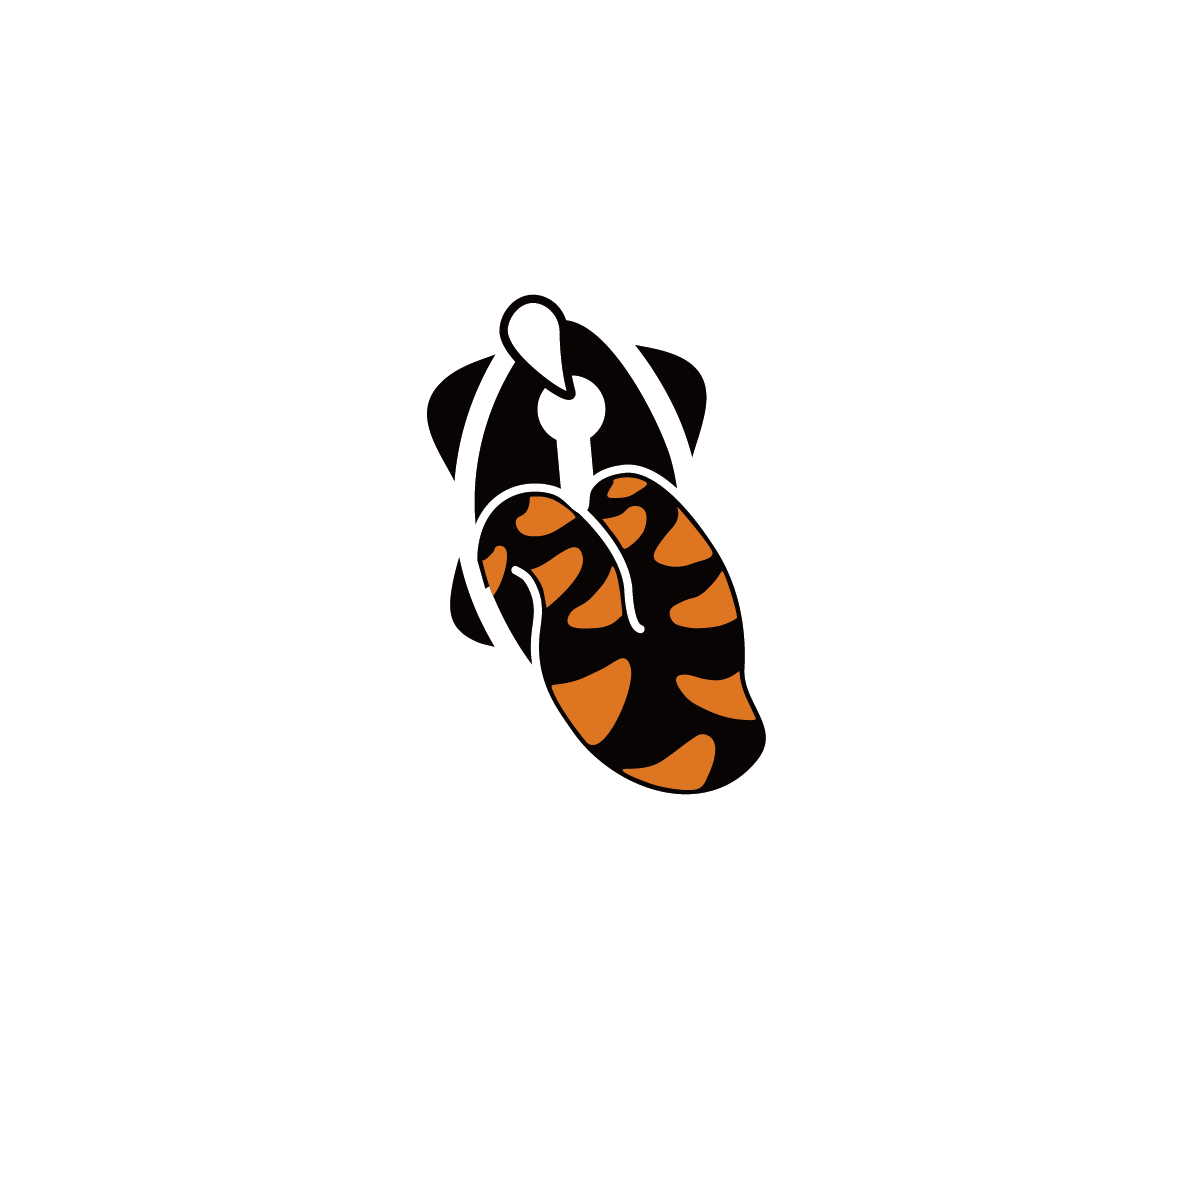 HKSP hksecretparty